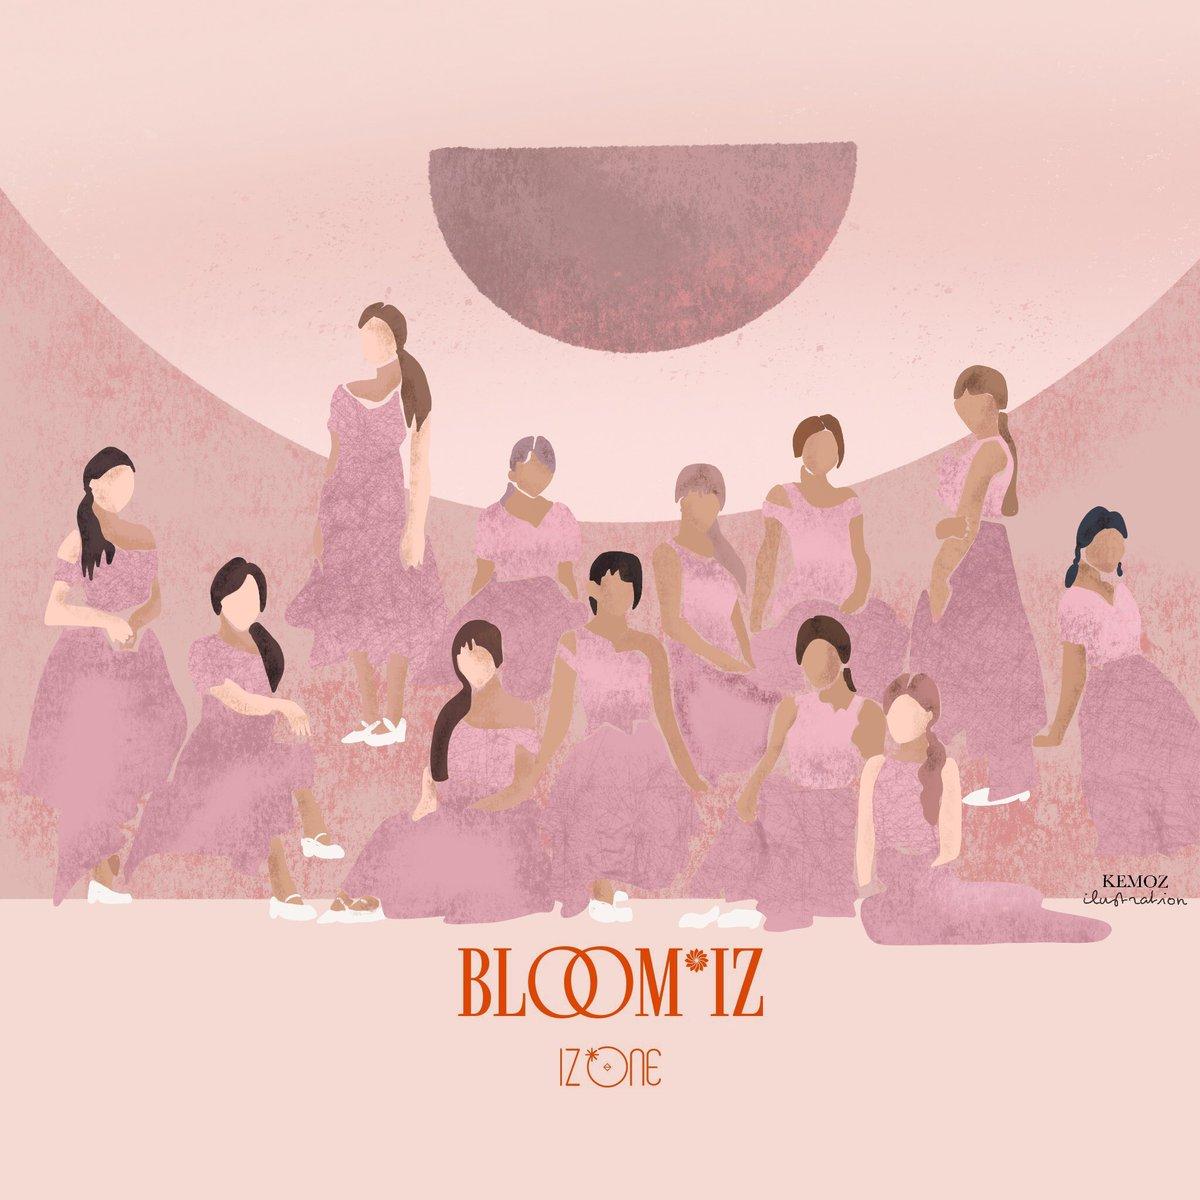 My @official_izone artwork, #BLOOMIZ #OurHightlightIZONE #AlwaysWithIZONE #WIZONELOVEIZONE . @IZSUBSID @izonemfs @Wizone_ID @IZONE_TH @IZ1Philippines @IZONEGLOBALTW .  I don't know why mu artwork deleted by twitter or something, I already upload this today twice.<br>http://pic.twitter.com/RWRv8khTFW